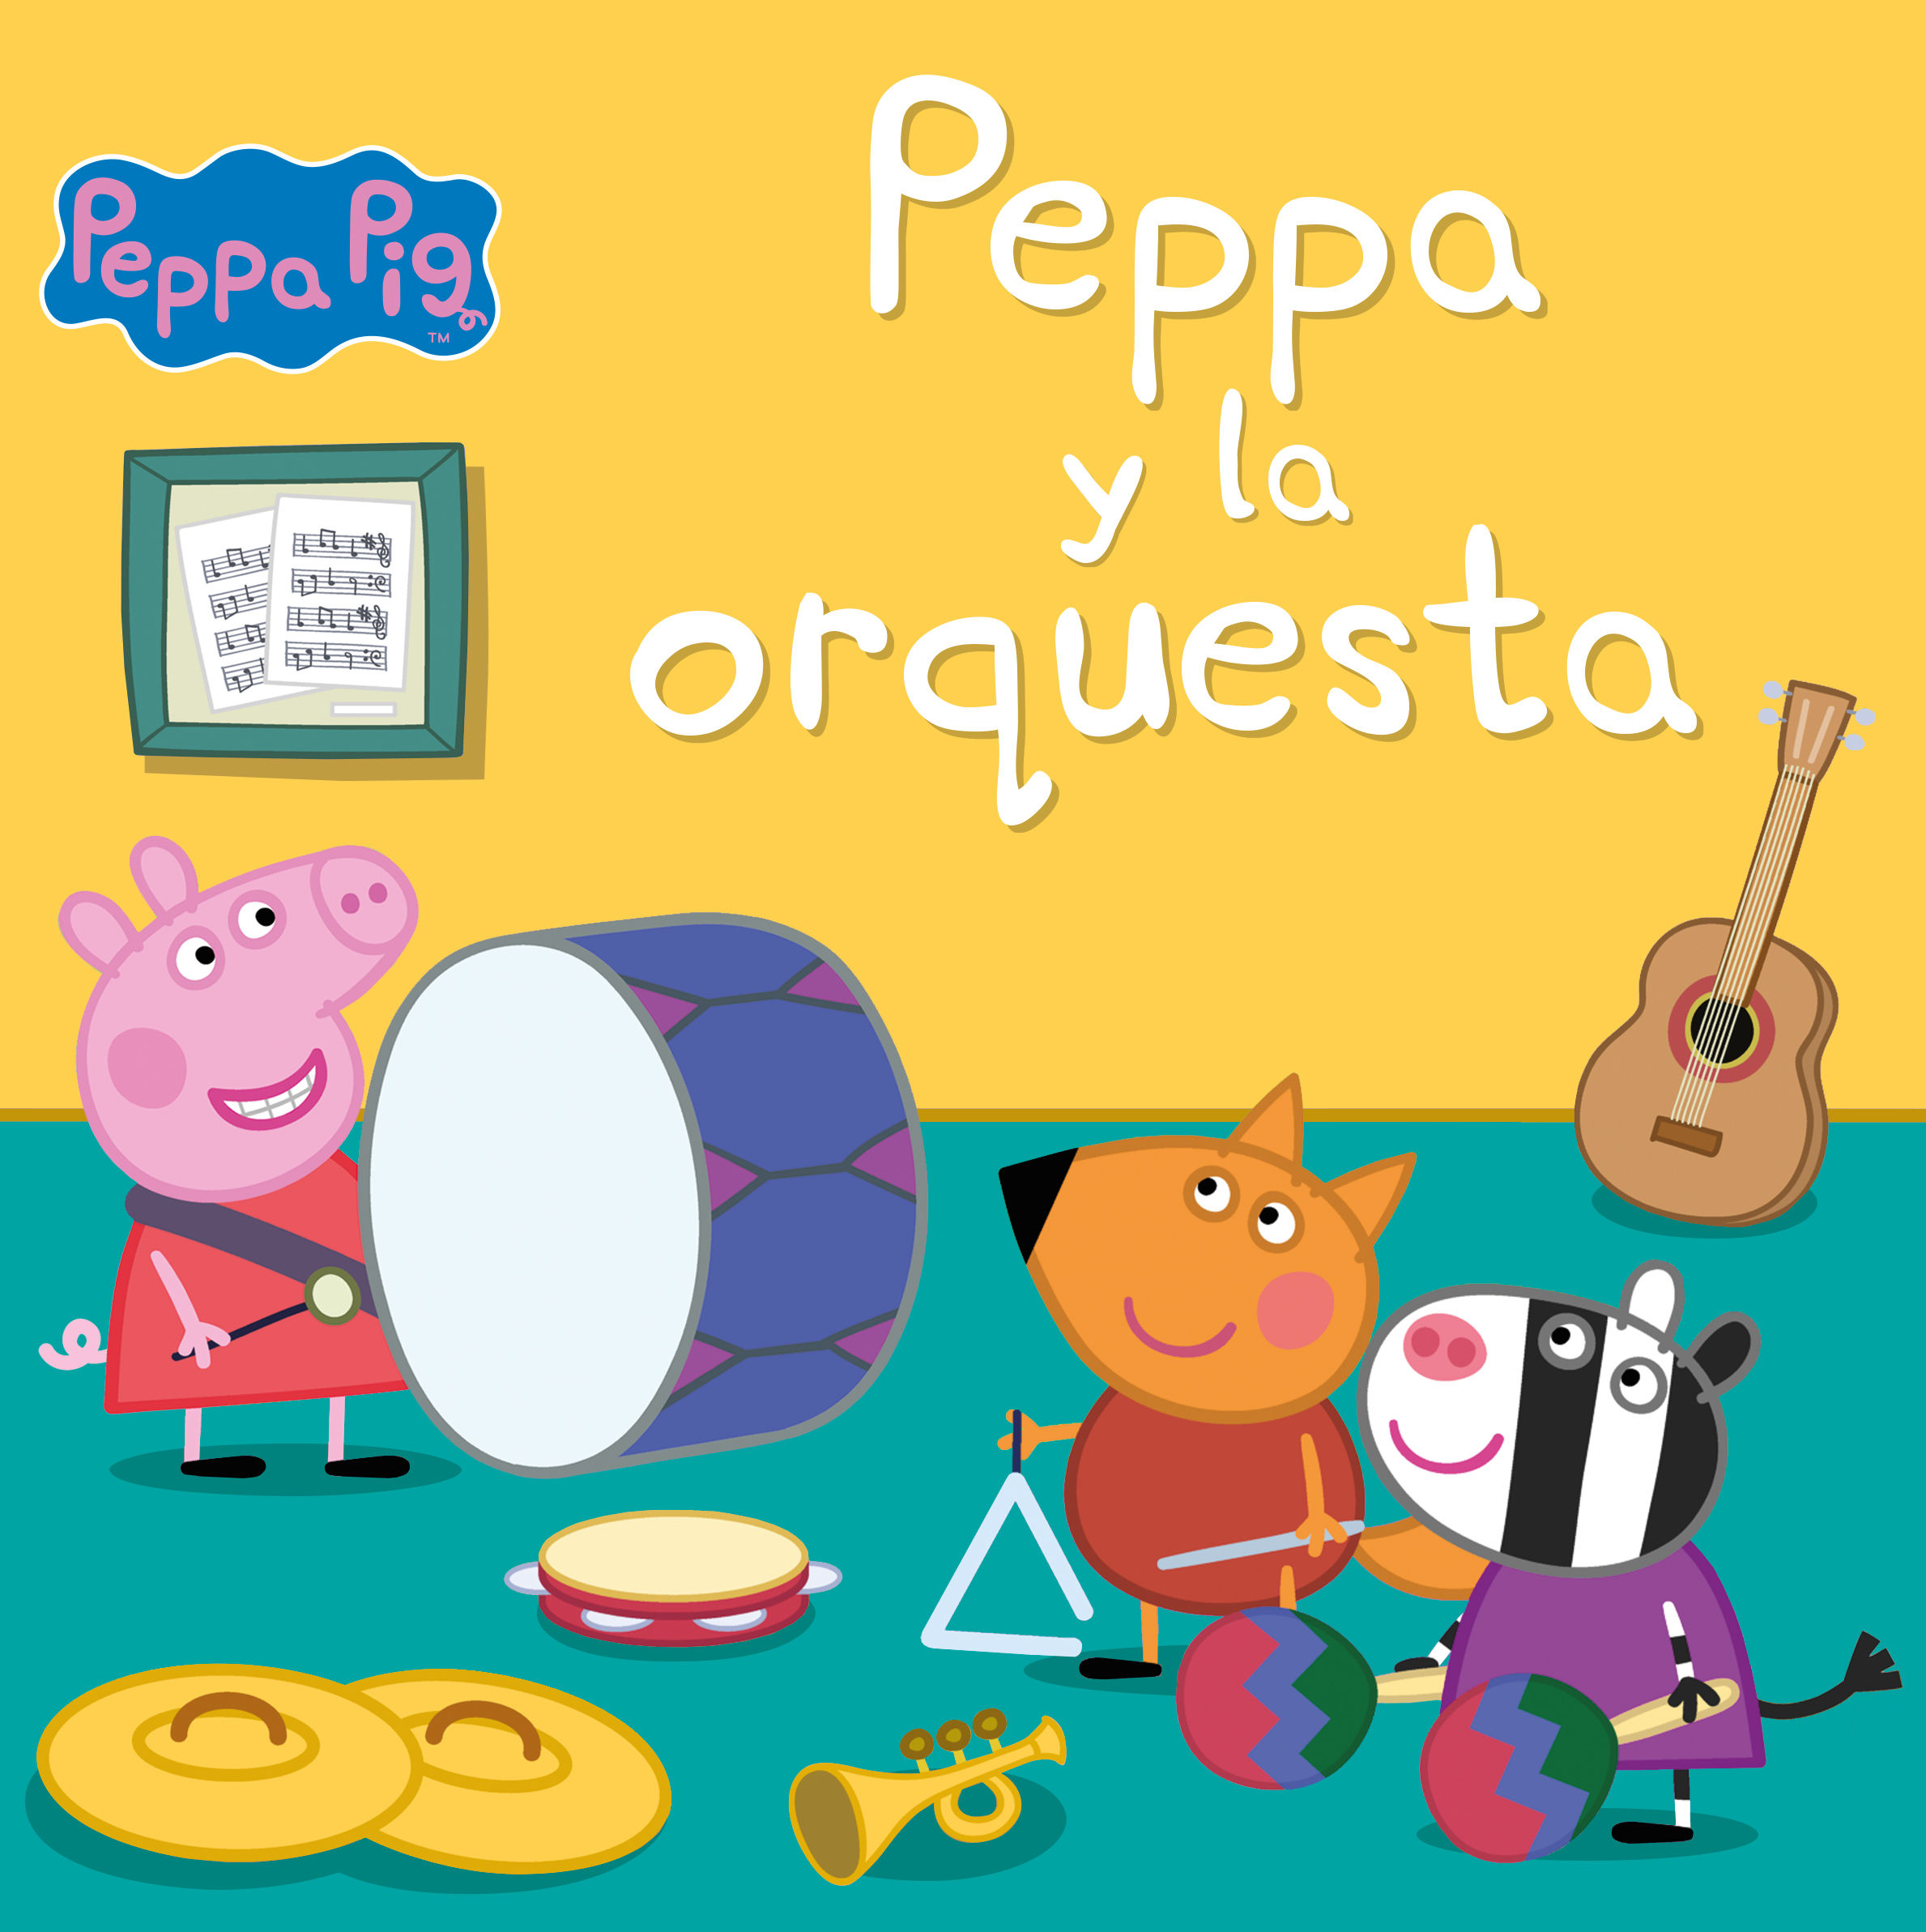 PEPPA PIG PEPPA Y LA ORQUESTA